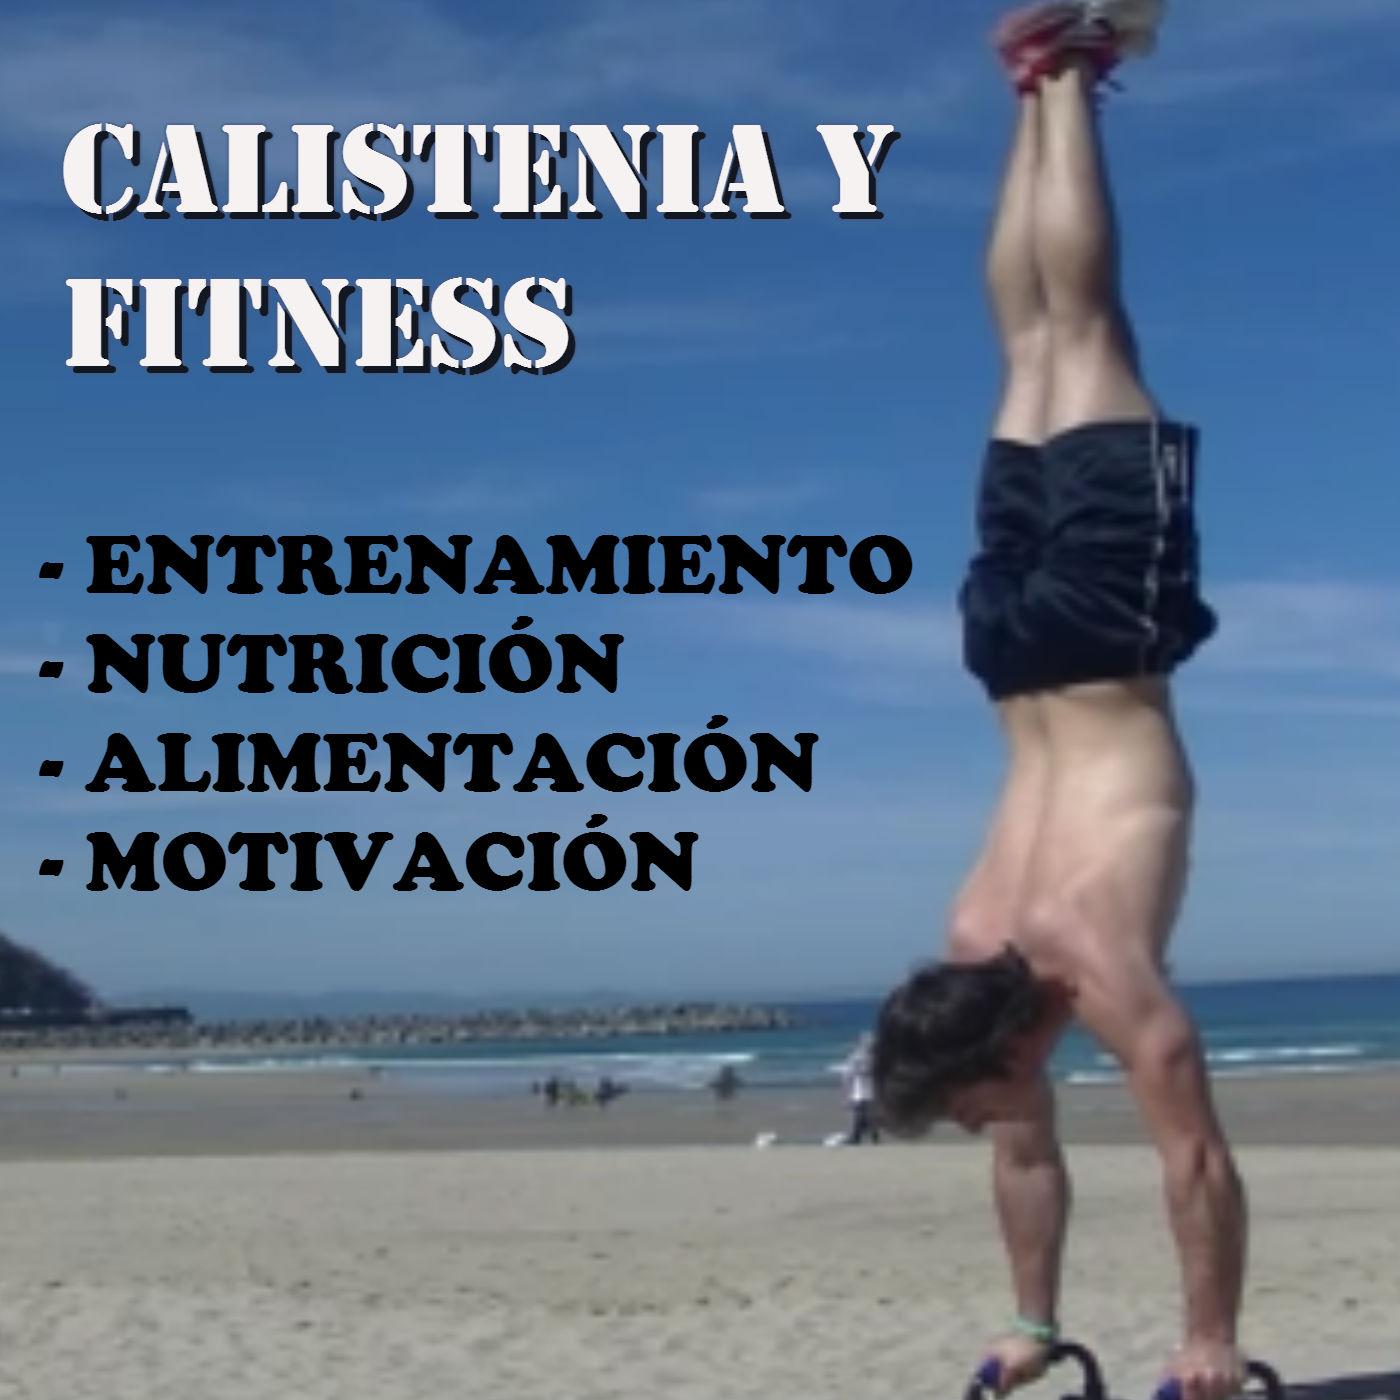 Calistenia y Fitness show art